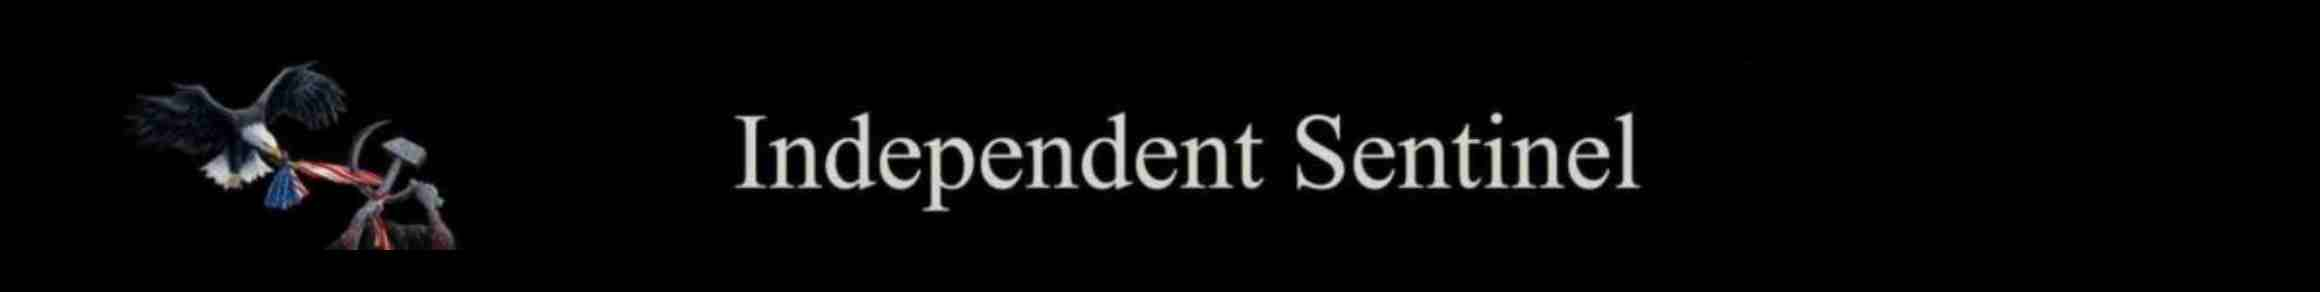 independentsentinel